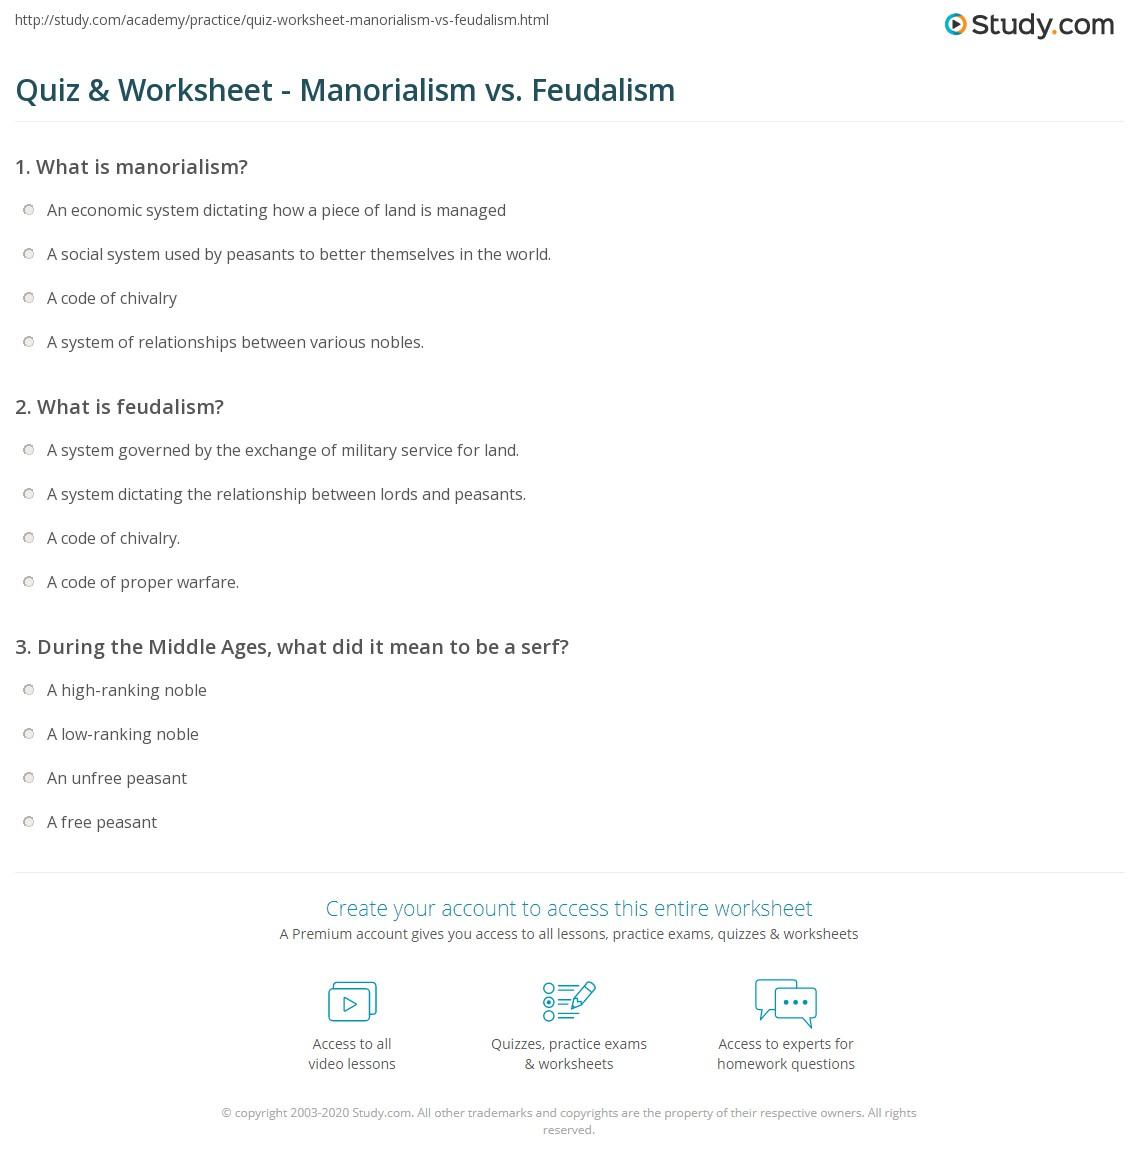 Quiz Worksheet Manorialism Vs Feudalism Study Com